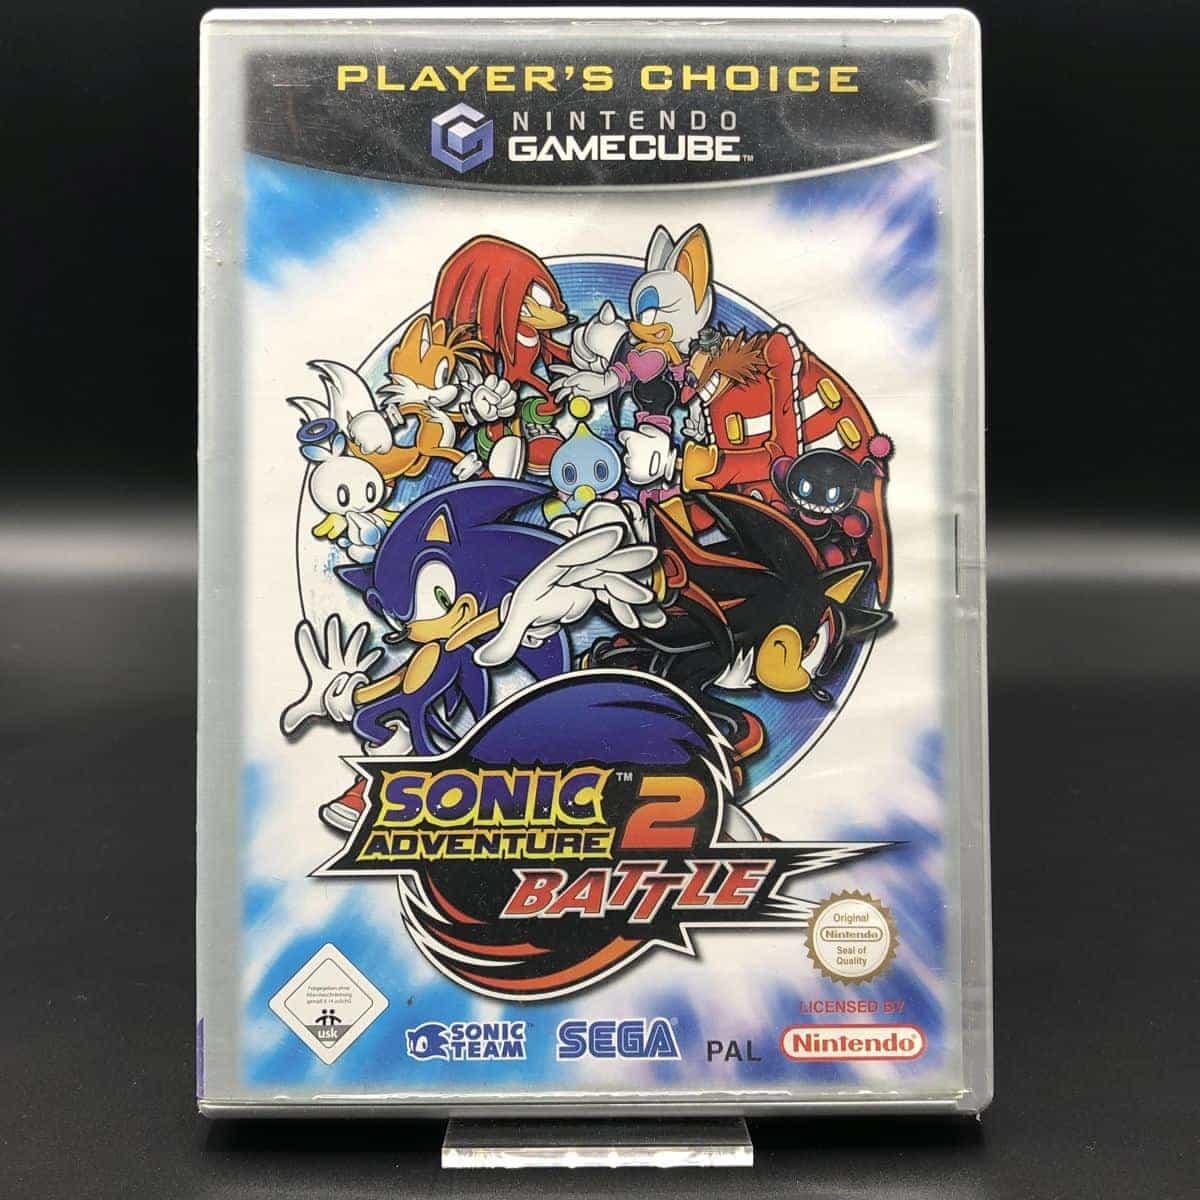 GC Sonic Adventure 2: Battle (Player's Choice) (Komplett) (Gebrauchsspuren) Nintendo GameCube